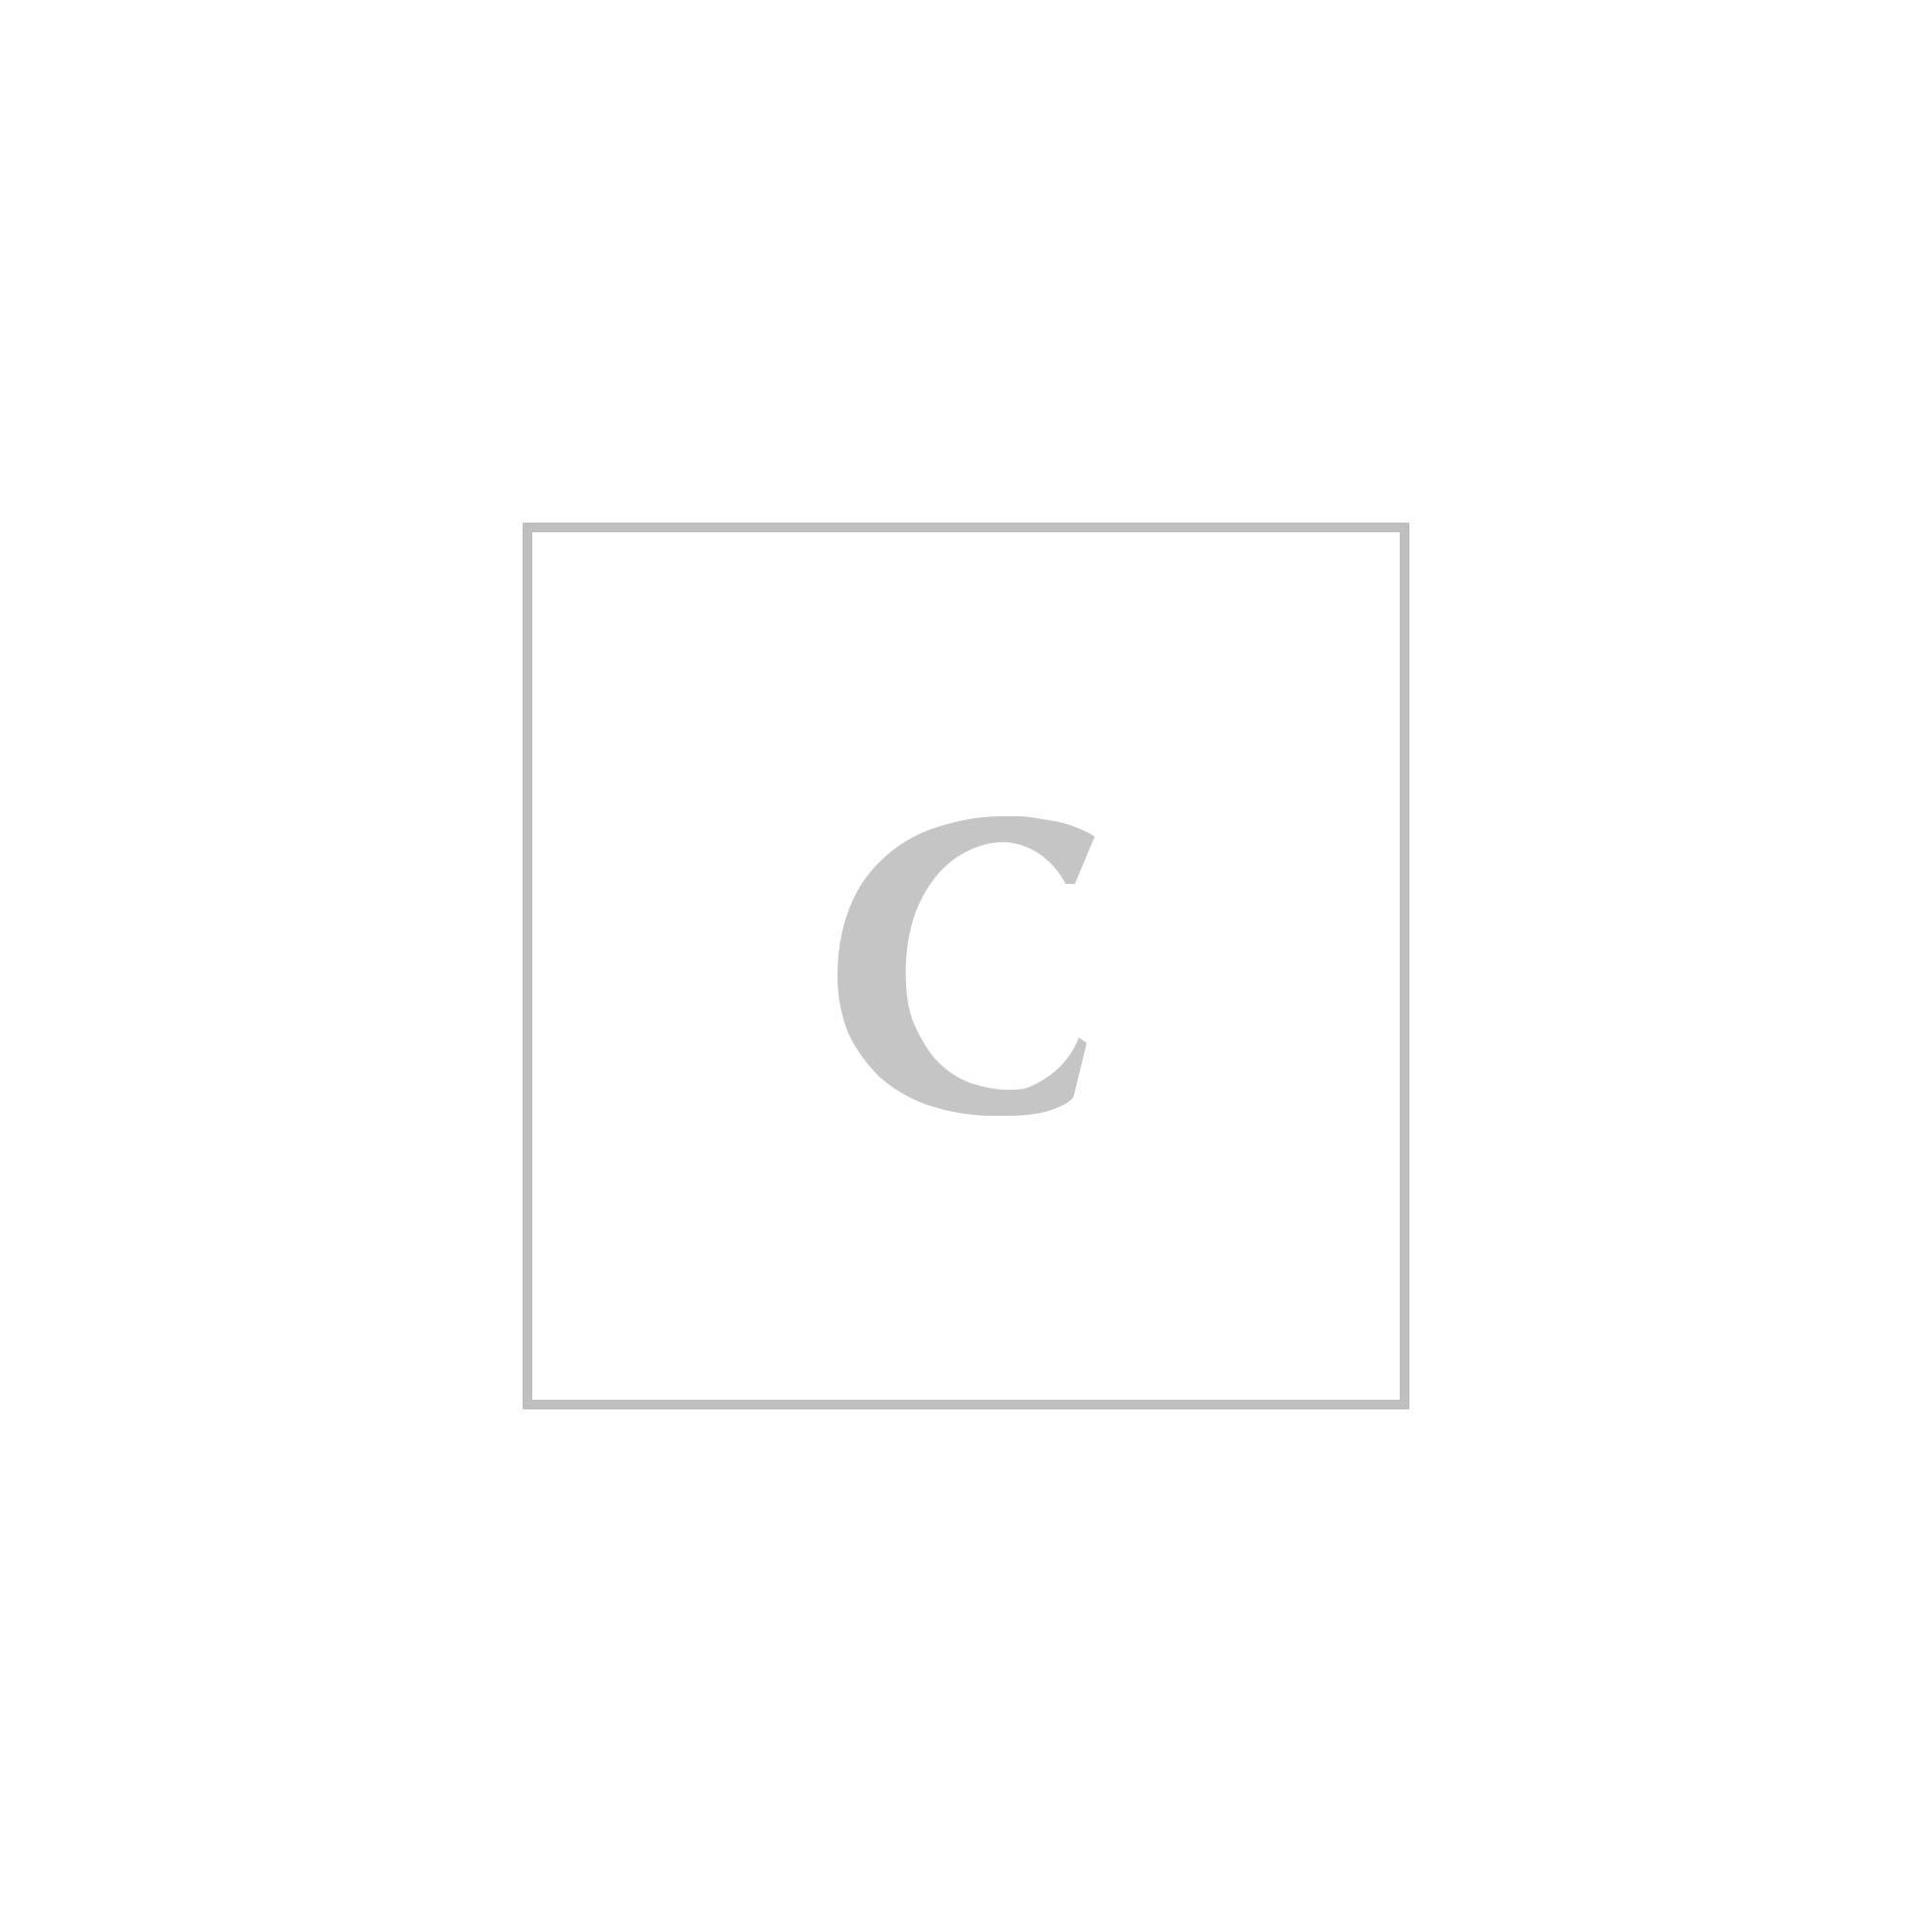 calvin klein established 1978 accessories women logo key charm